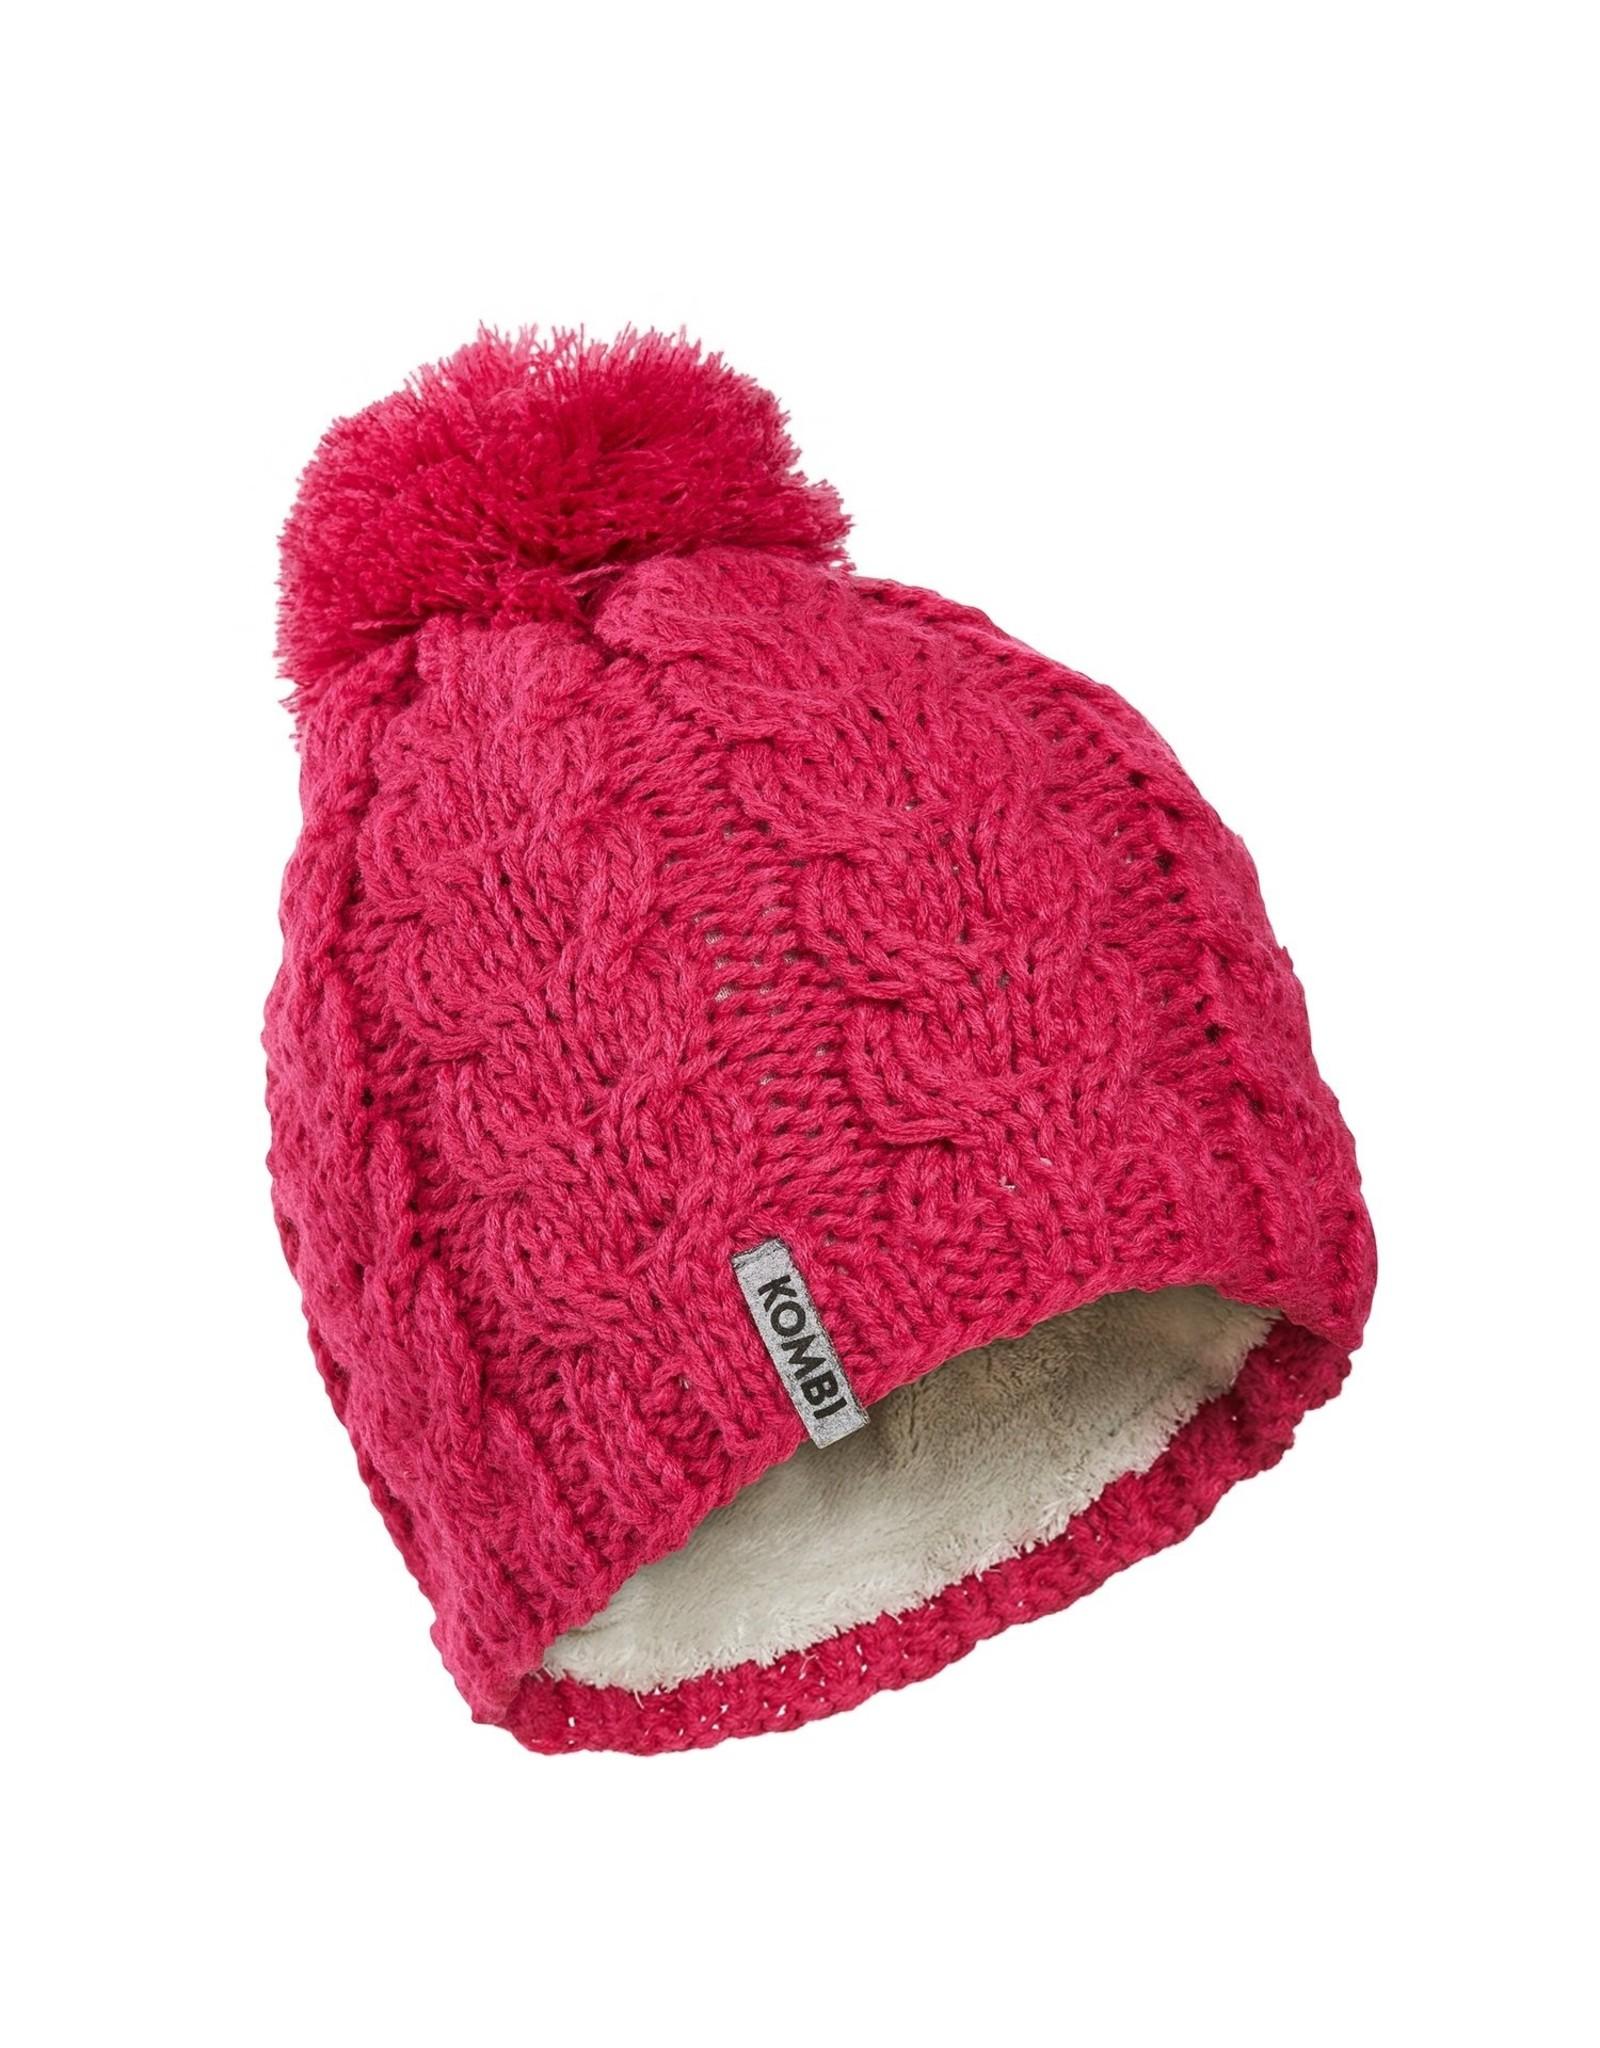 Kombi Kombi Apex Jr Hat